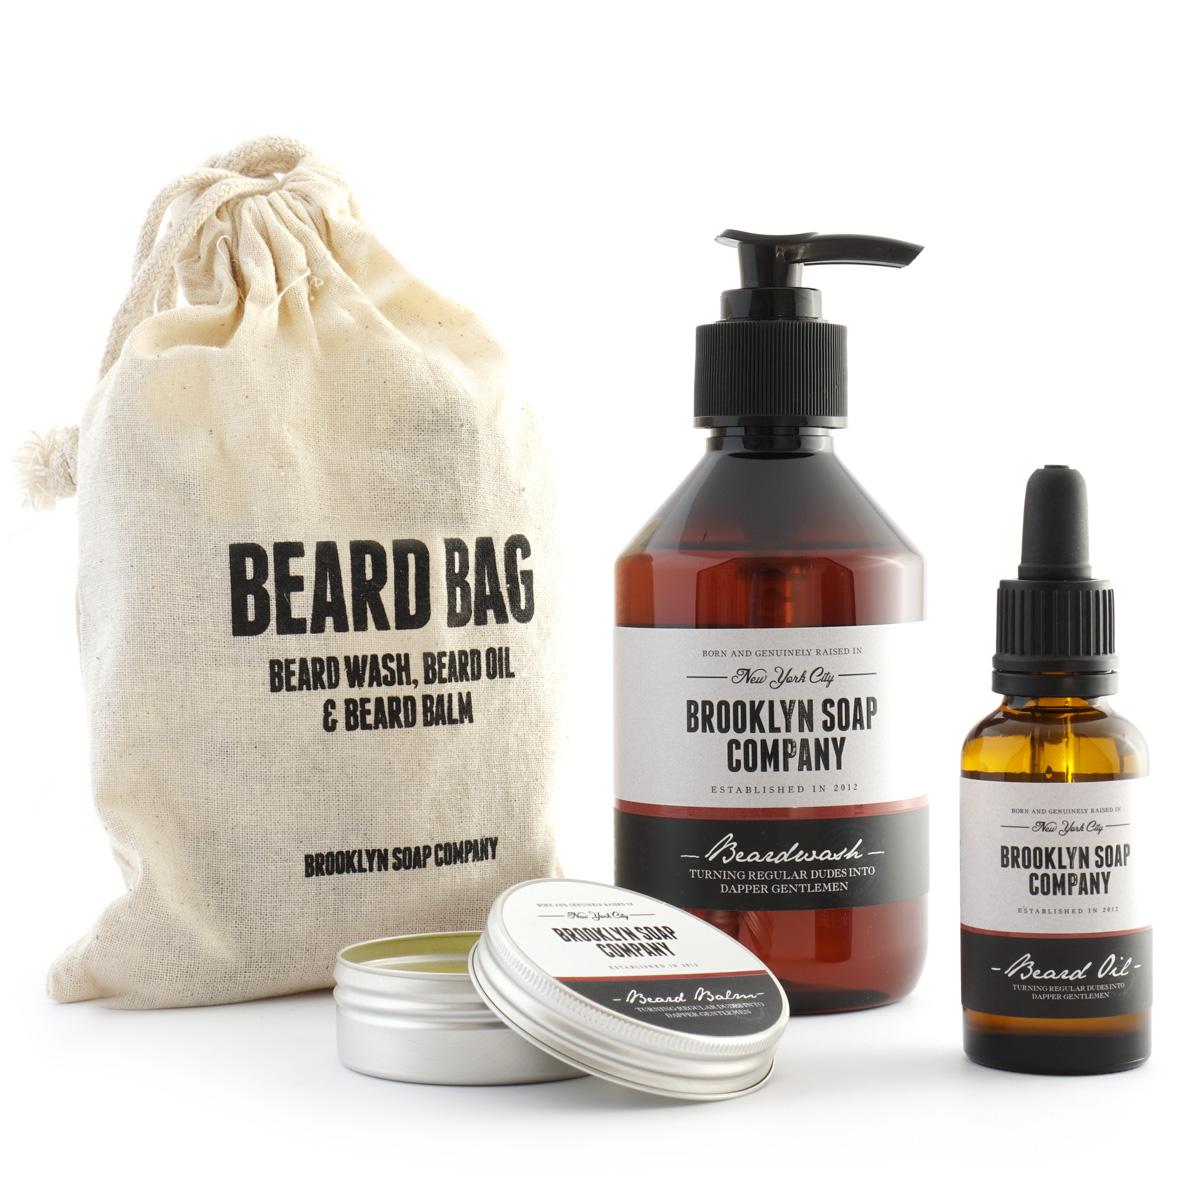 Beard Bag